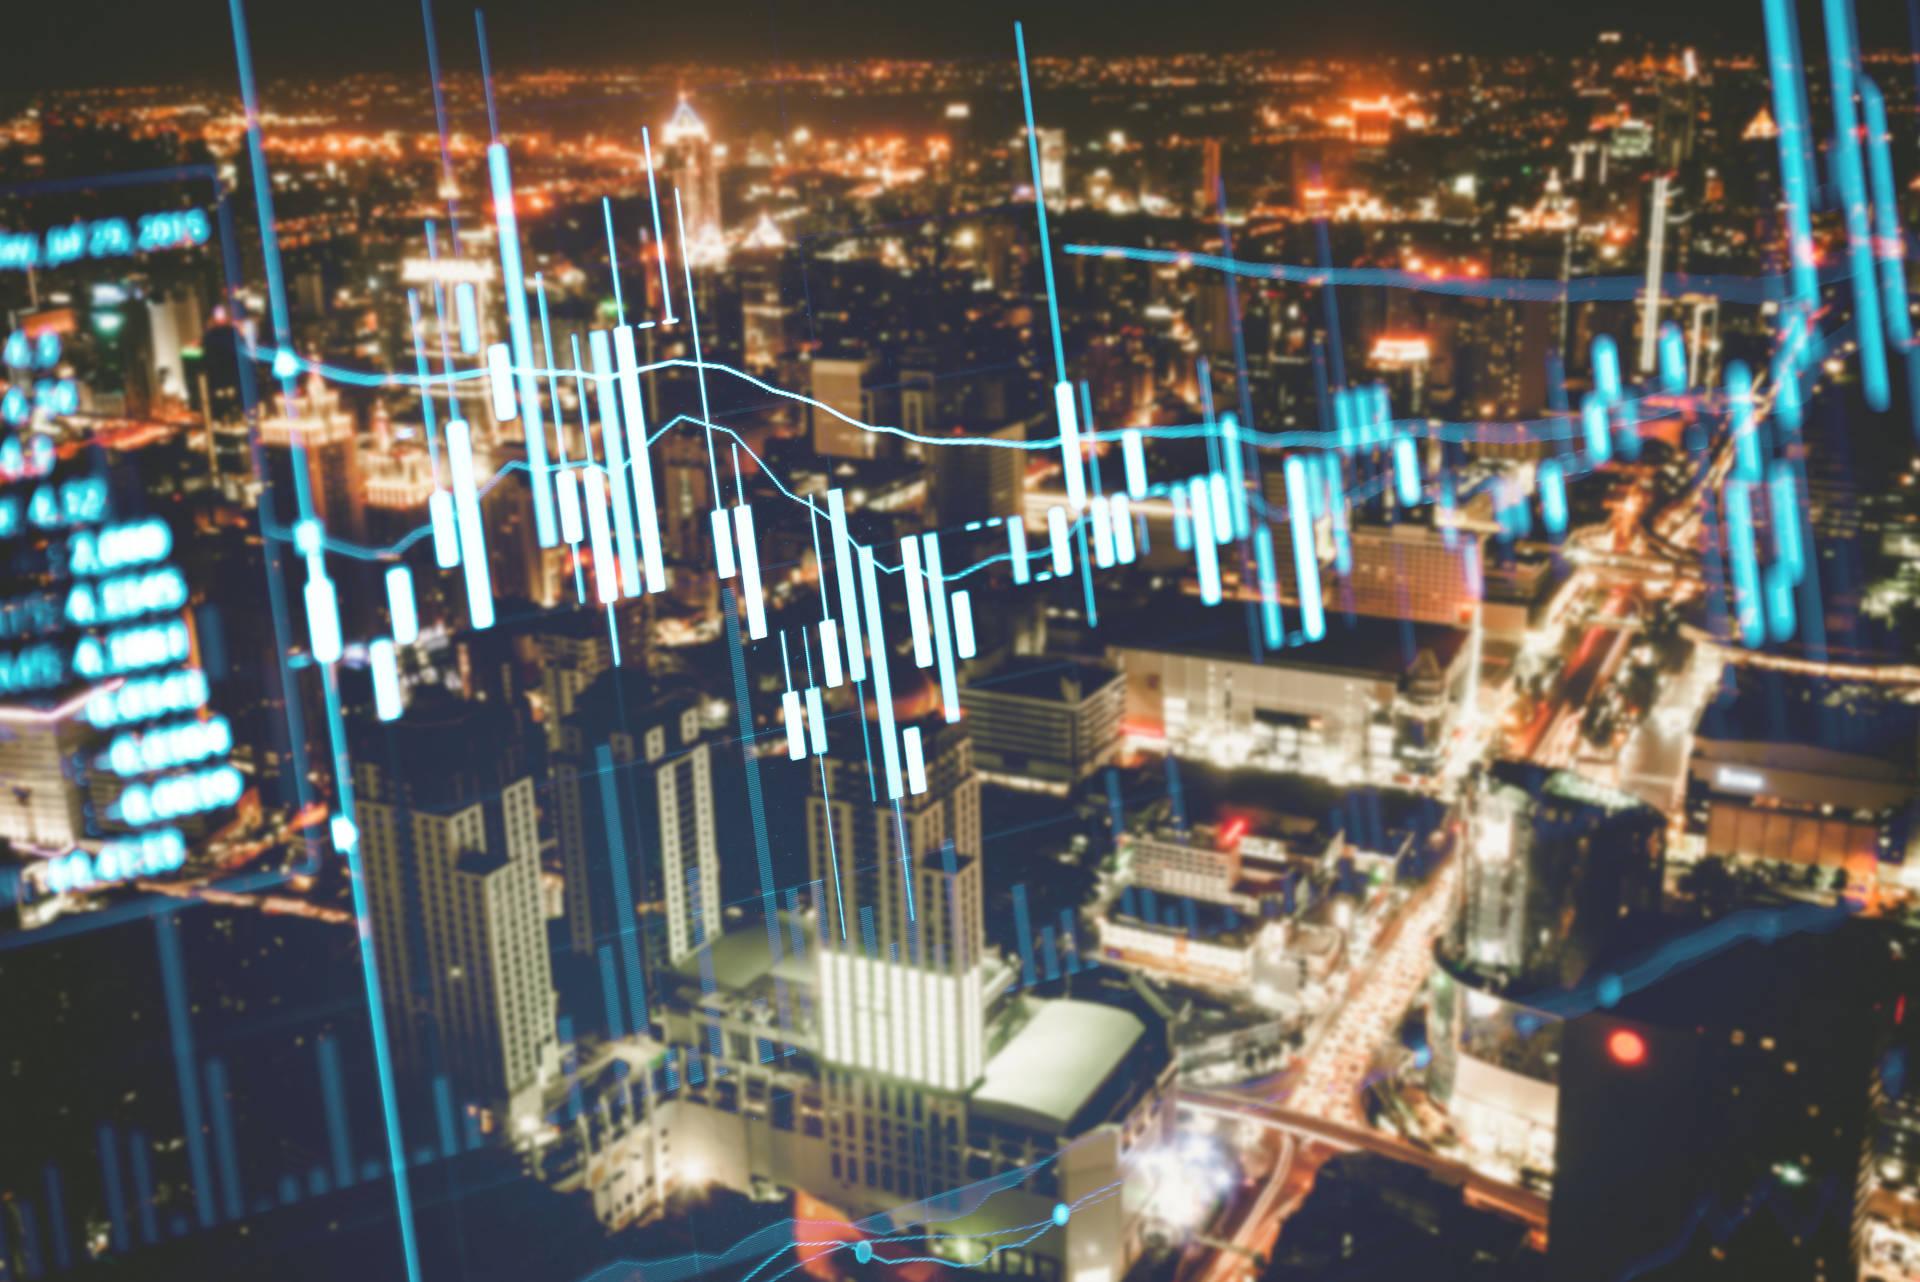 Market report image 15/5